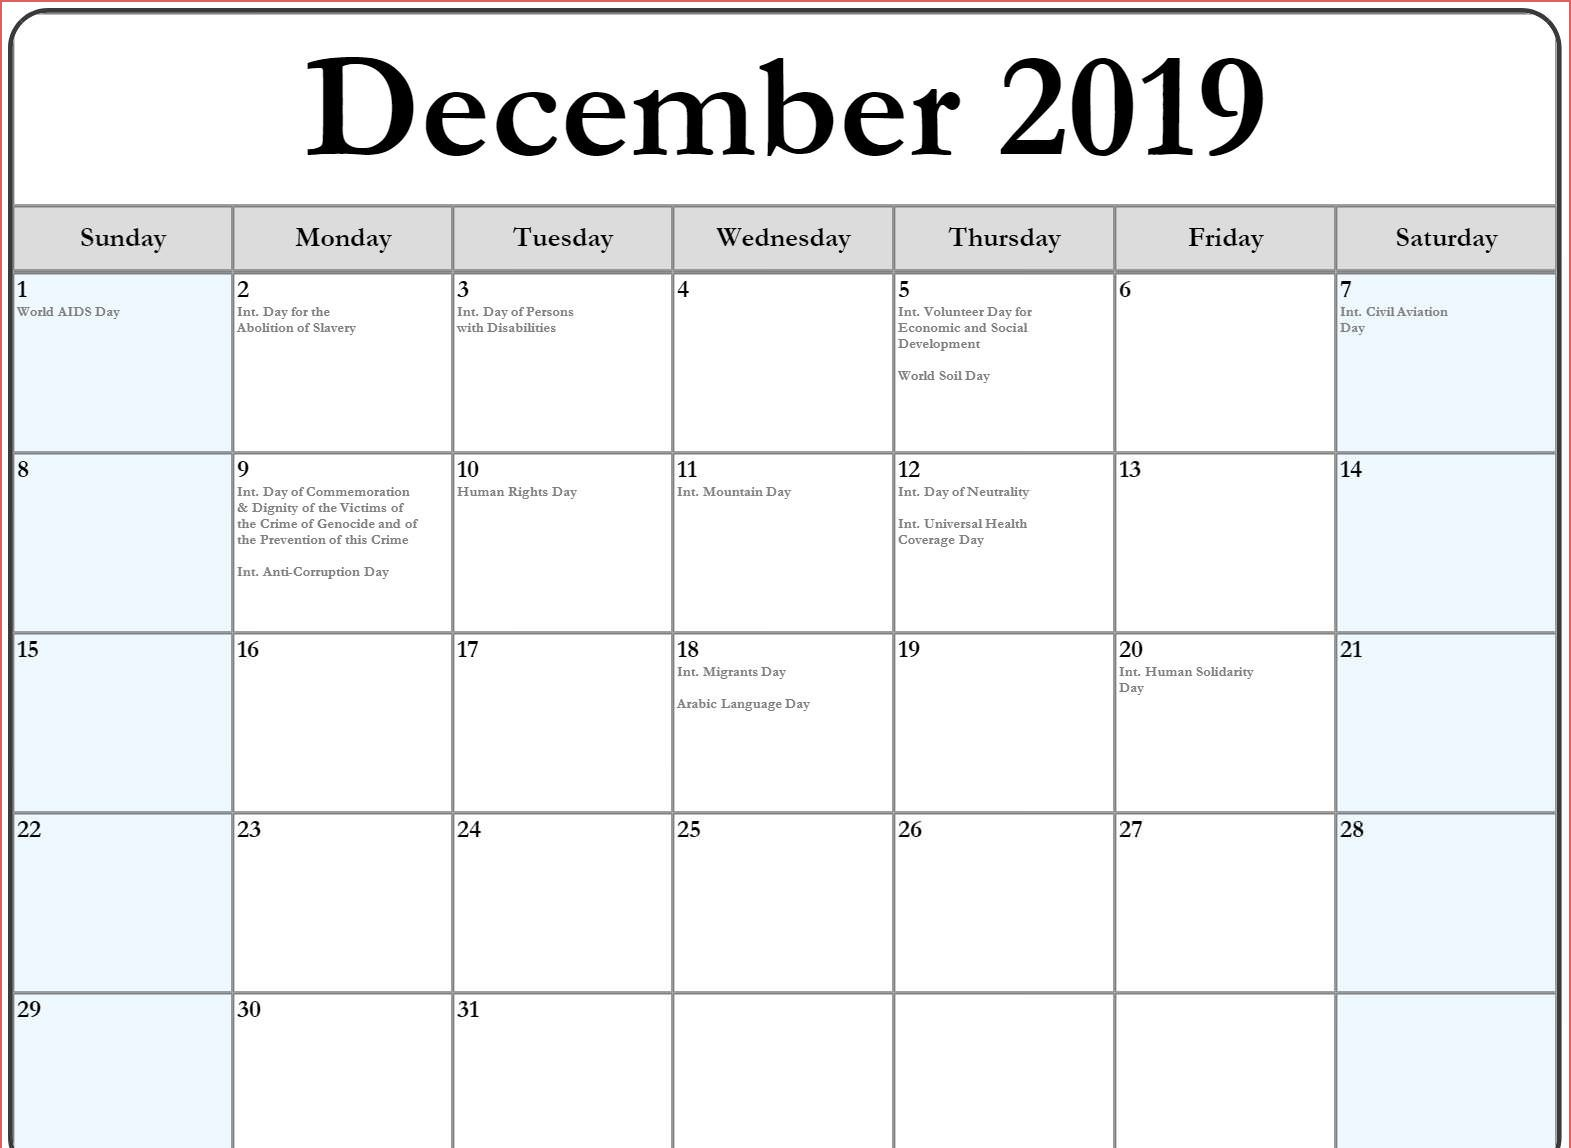 December 2019 Calendar With Holidays US